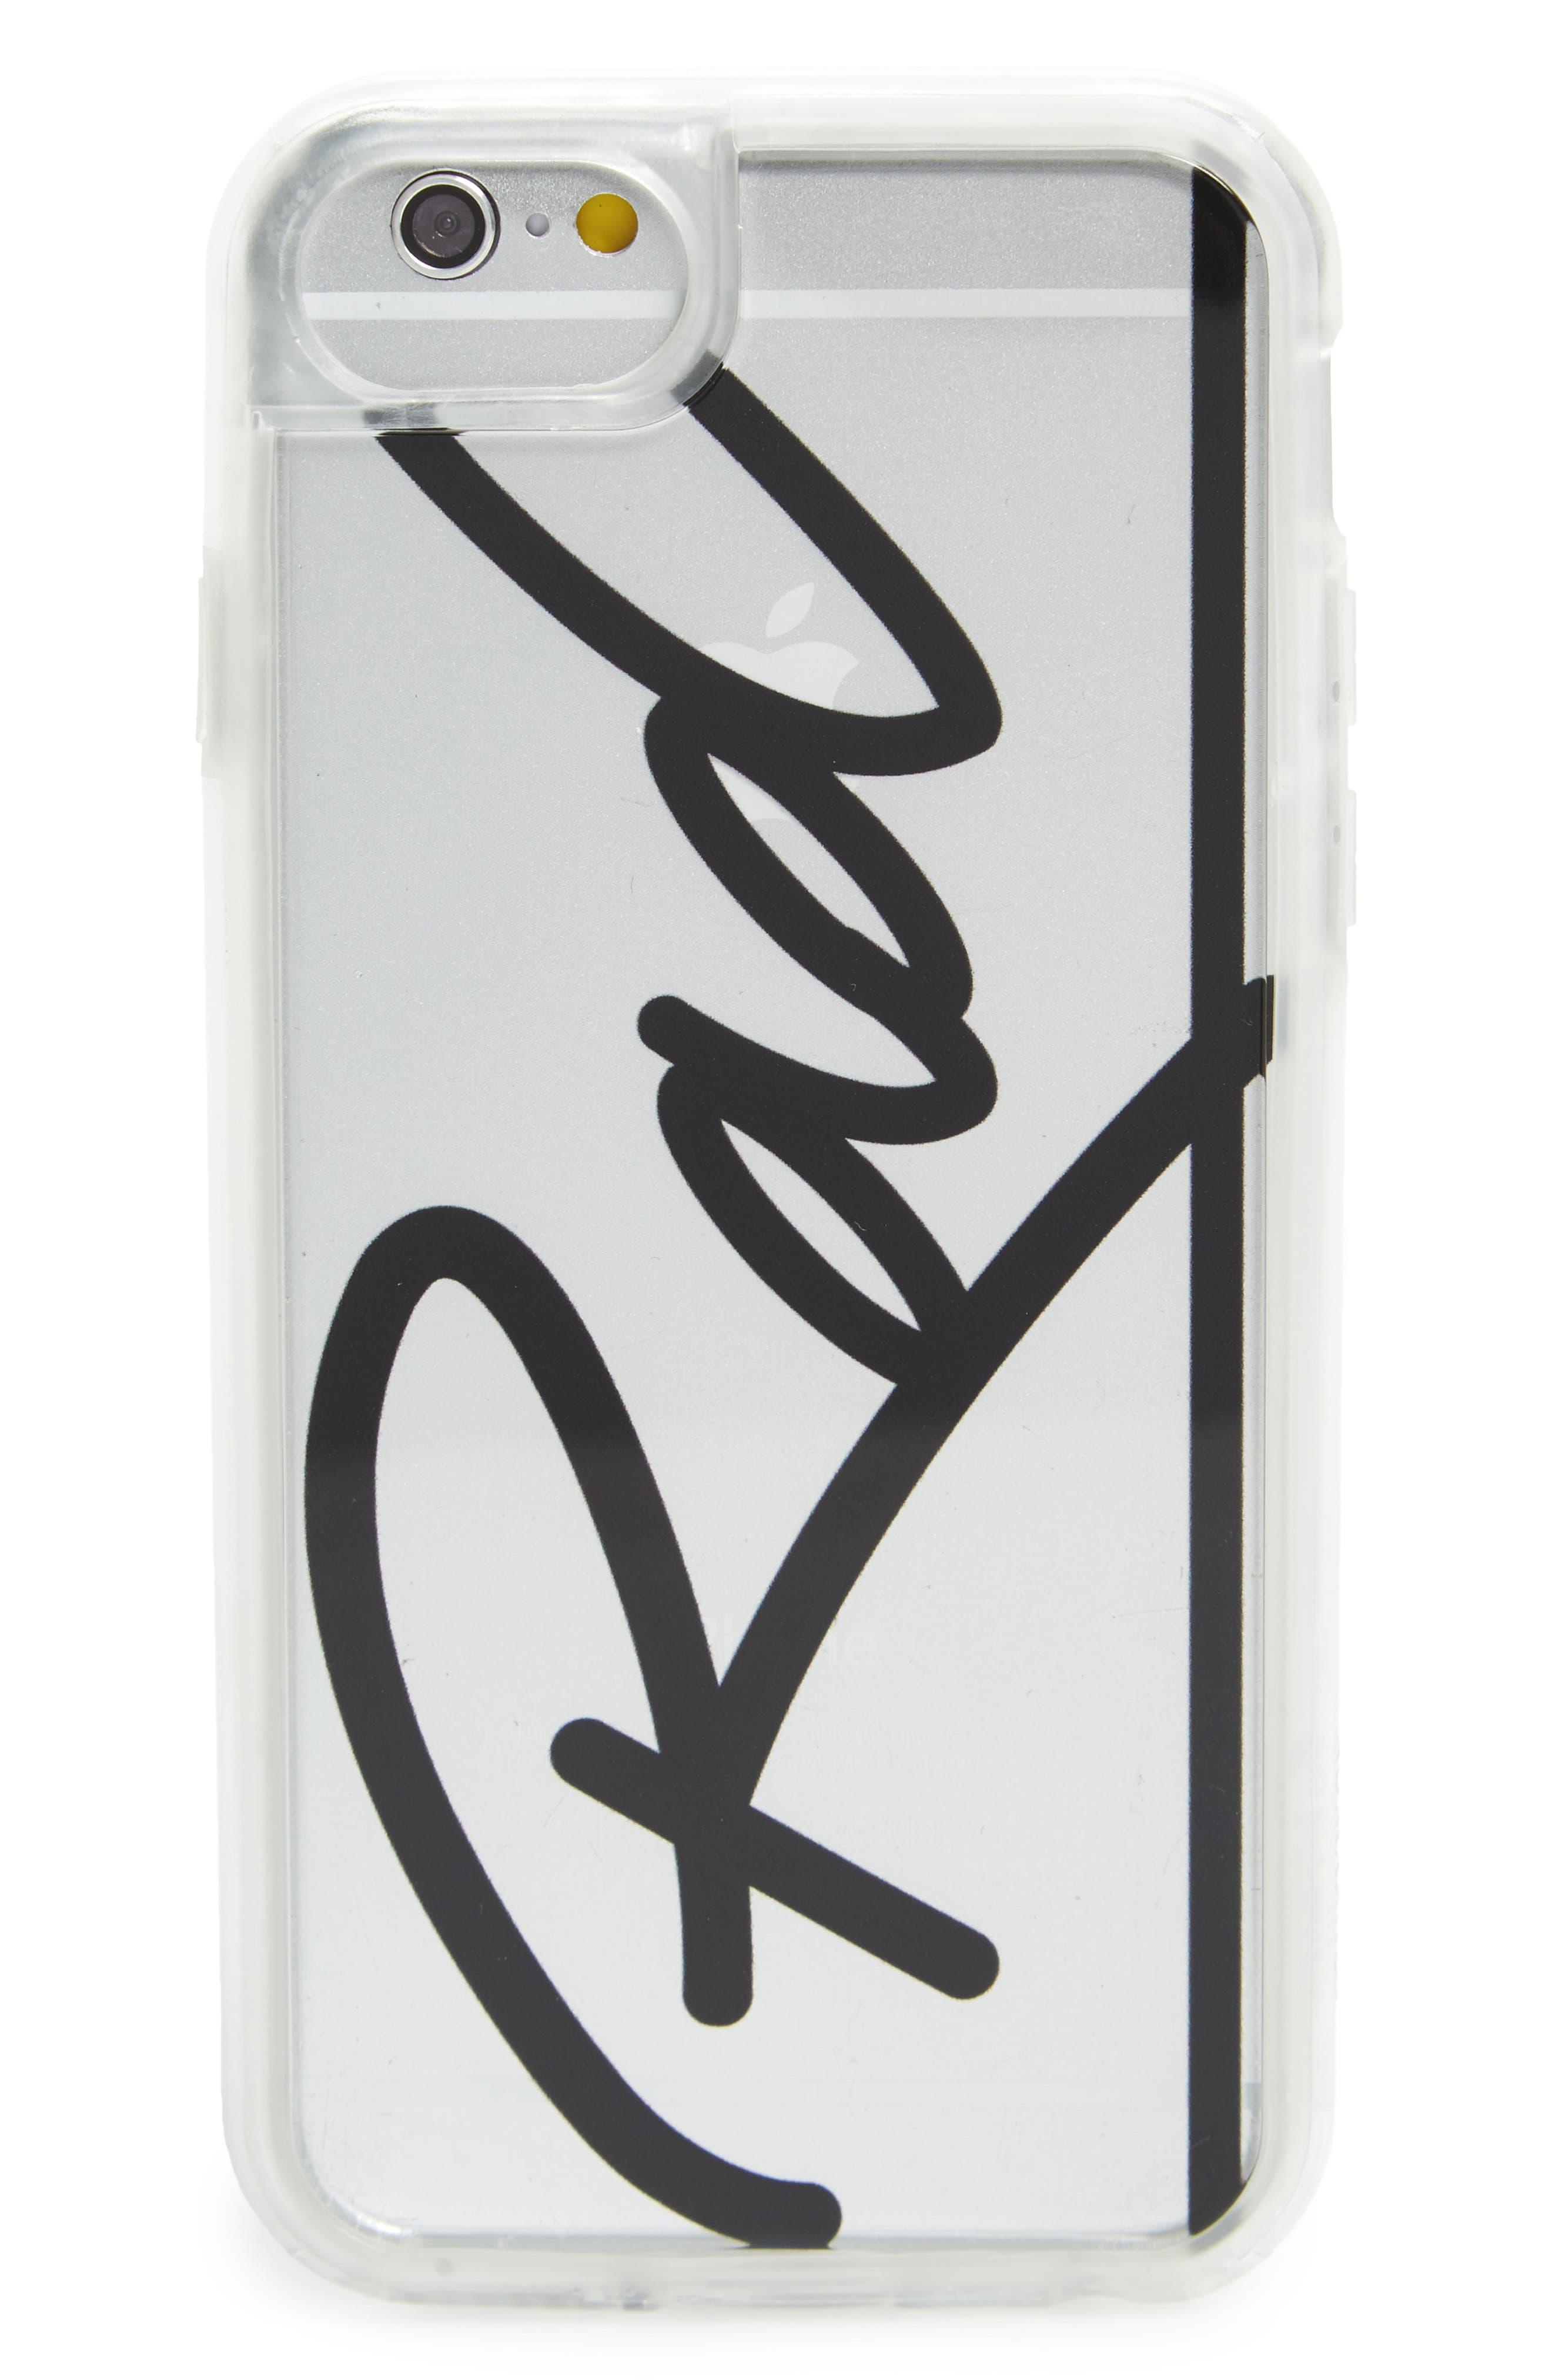 MILKYWAY Rad iPhone 6/6s/7 Case